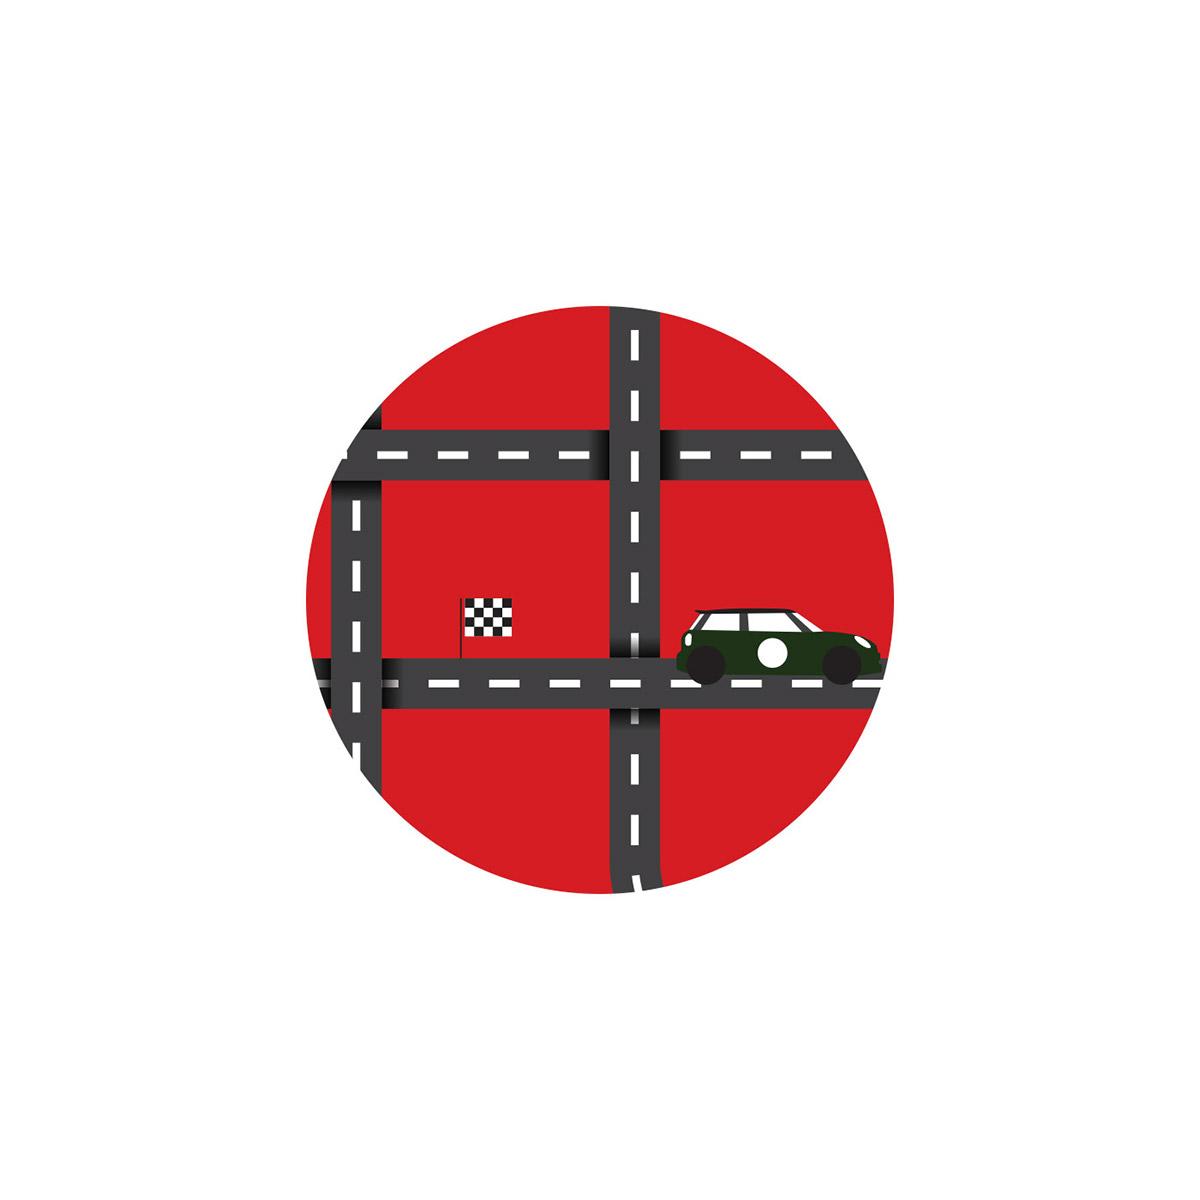 MINI Cooper S JCW Racing rally artwork Nanni Nember minimal minimaldesign inminimalwetrust